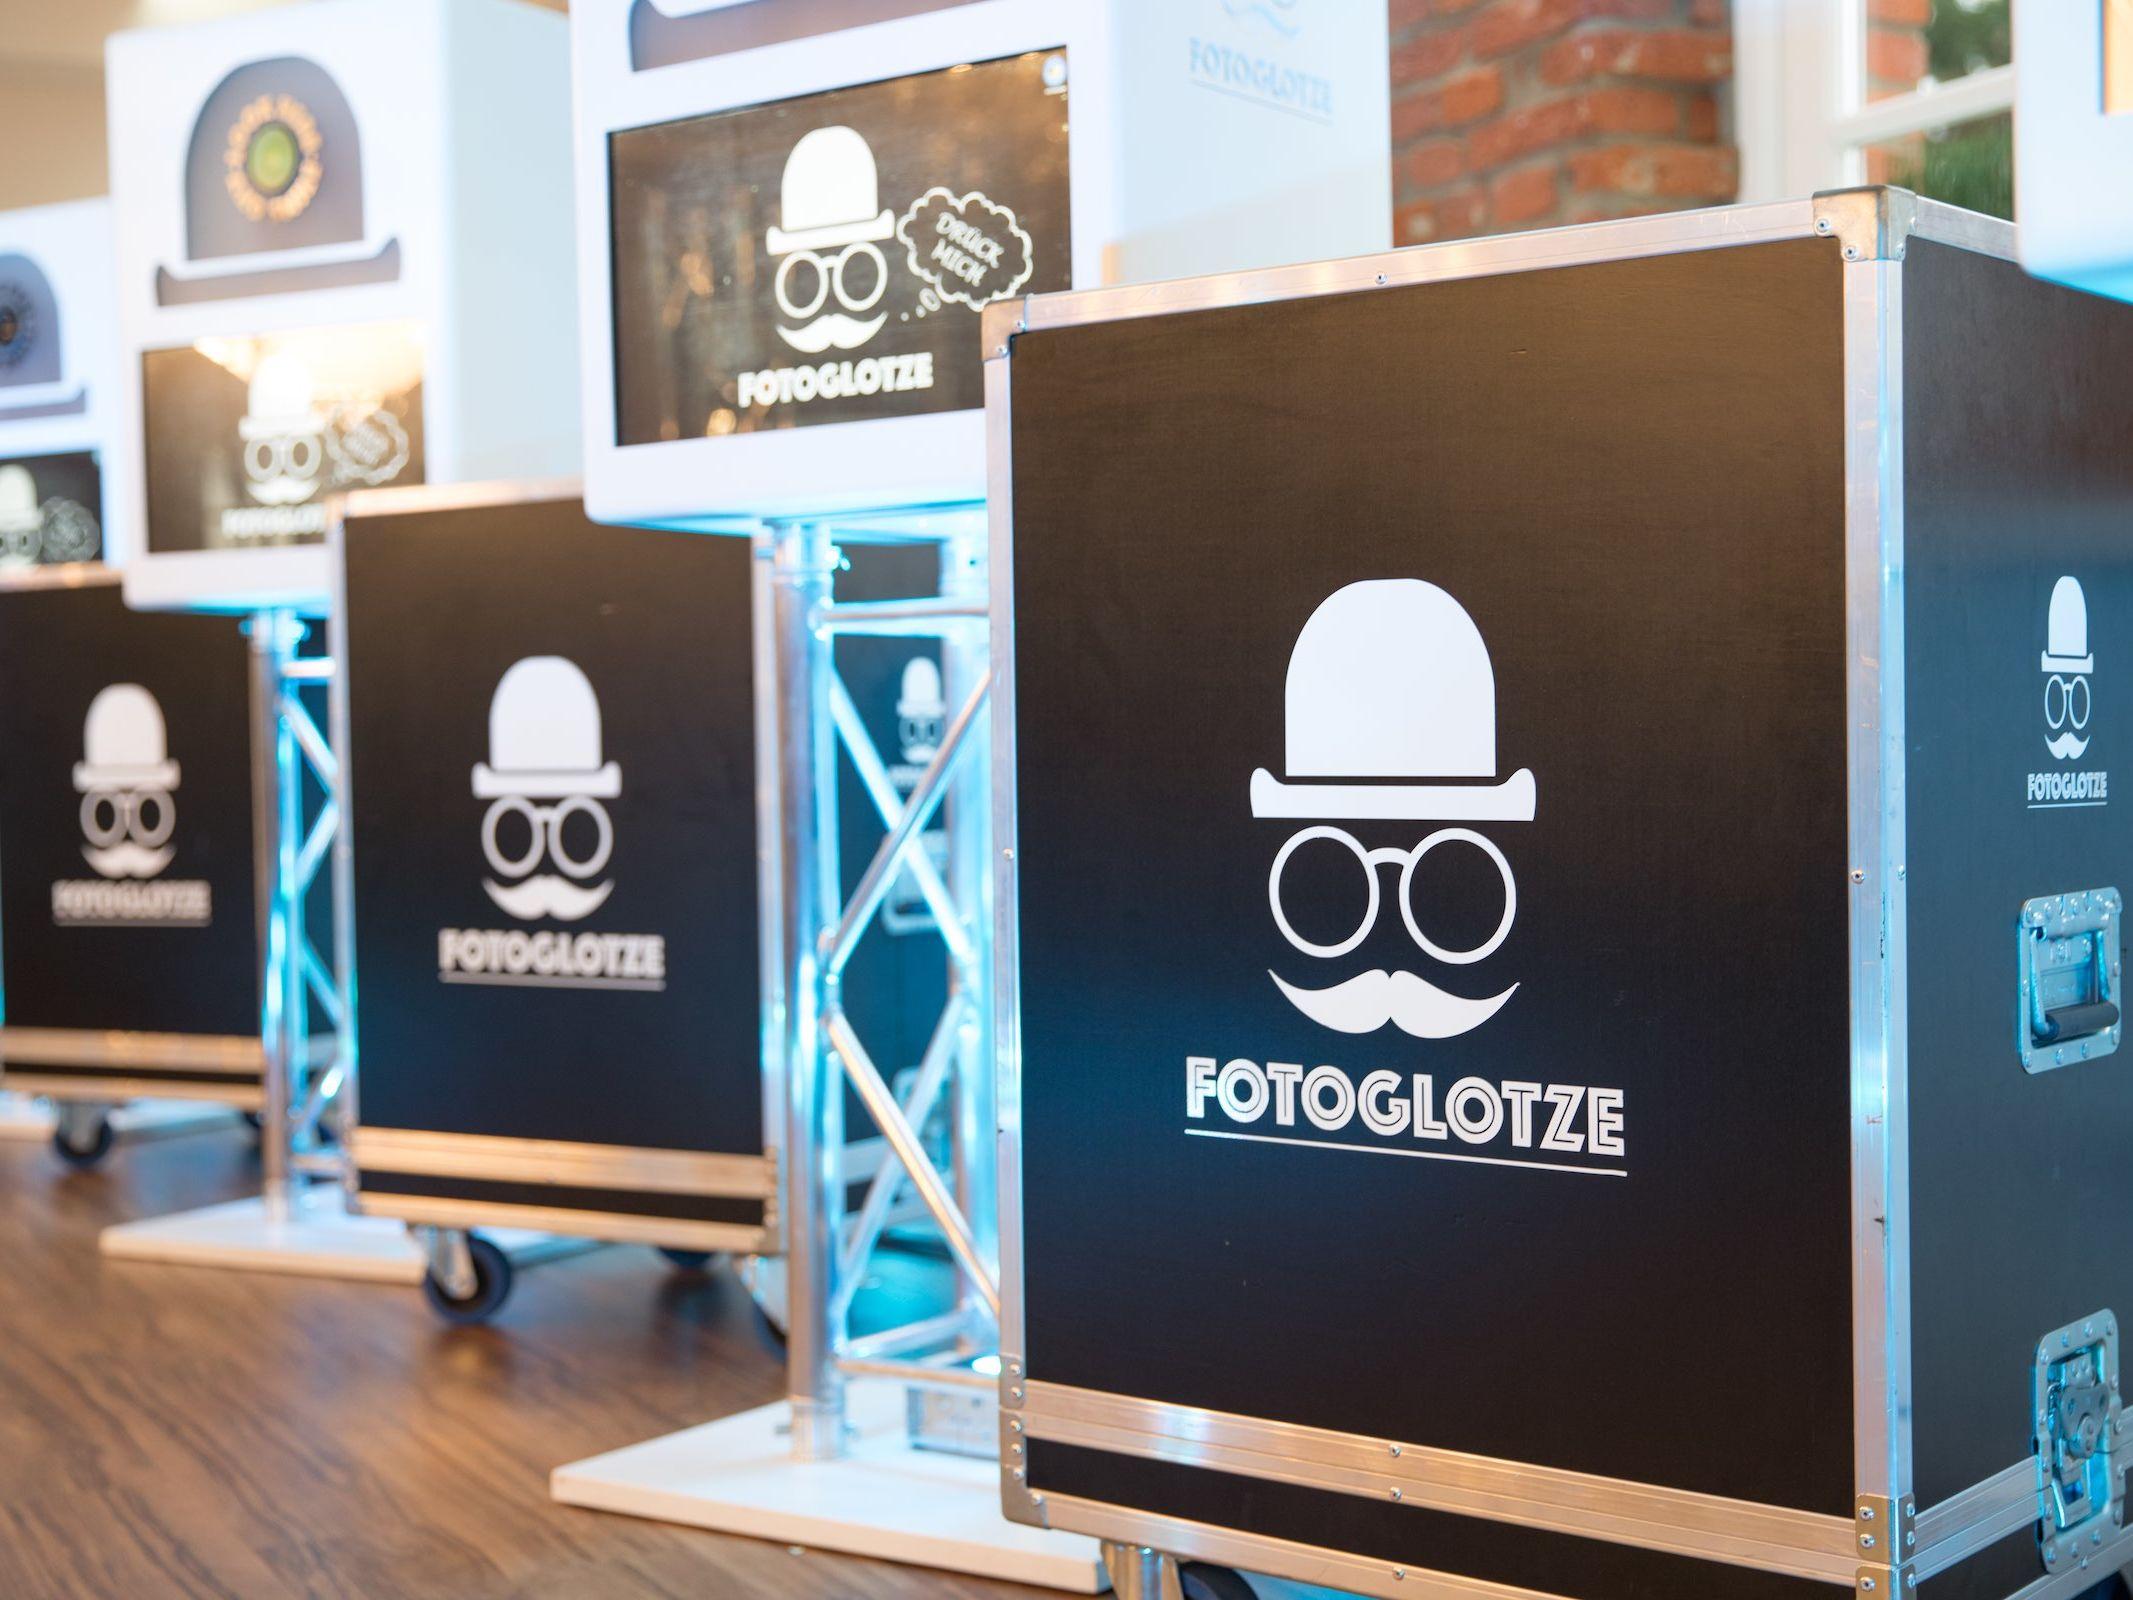 Fotobox | Mieten | Ausdruck | Photobooth | Hannover | Sofortdruck | Geburtstg | Messe | Firmenfeier | Hochzeit | Fotoglotze | Fotokiste | Buchen | Lehmann | Eventservice